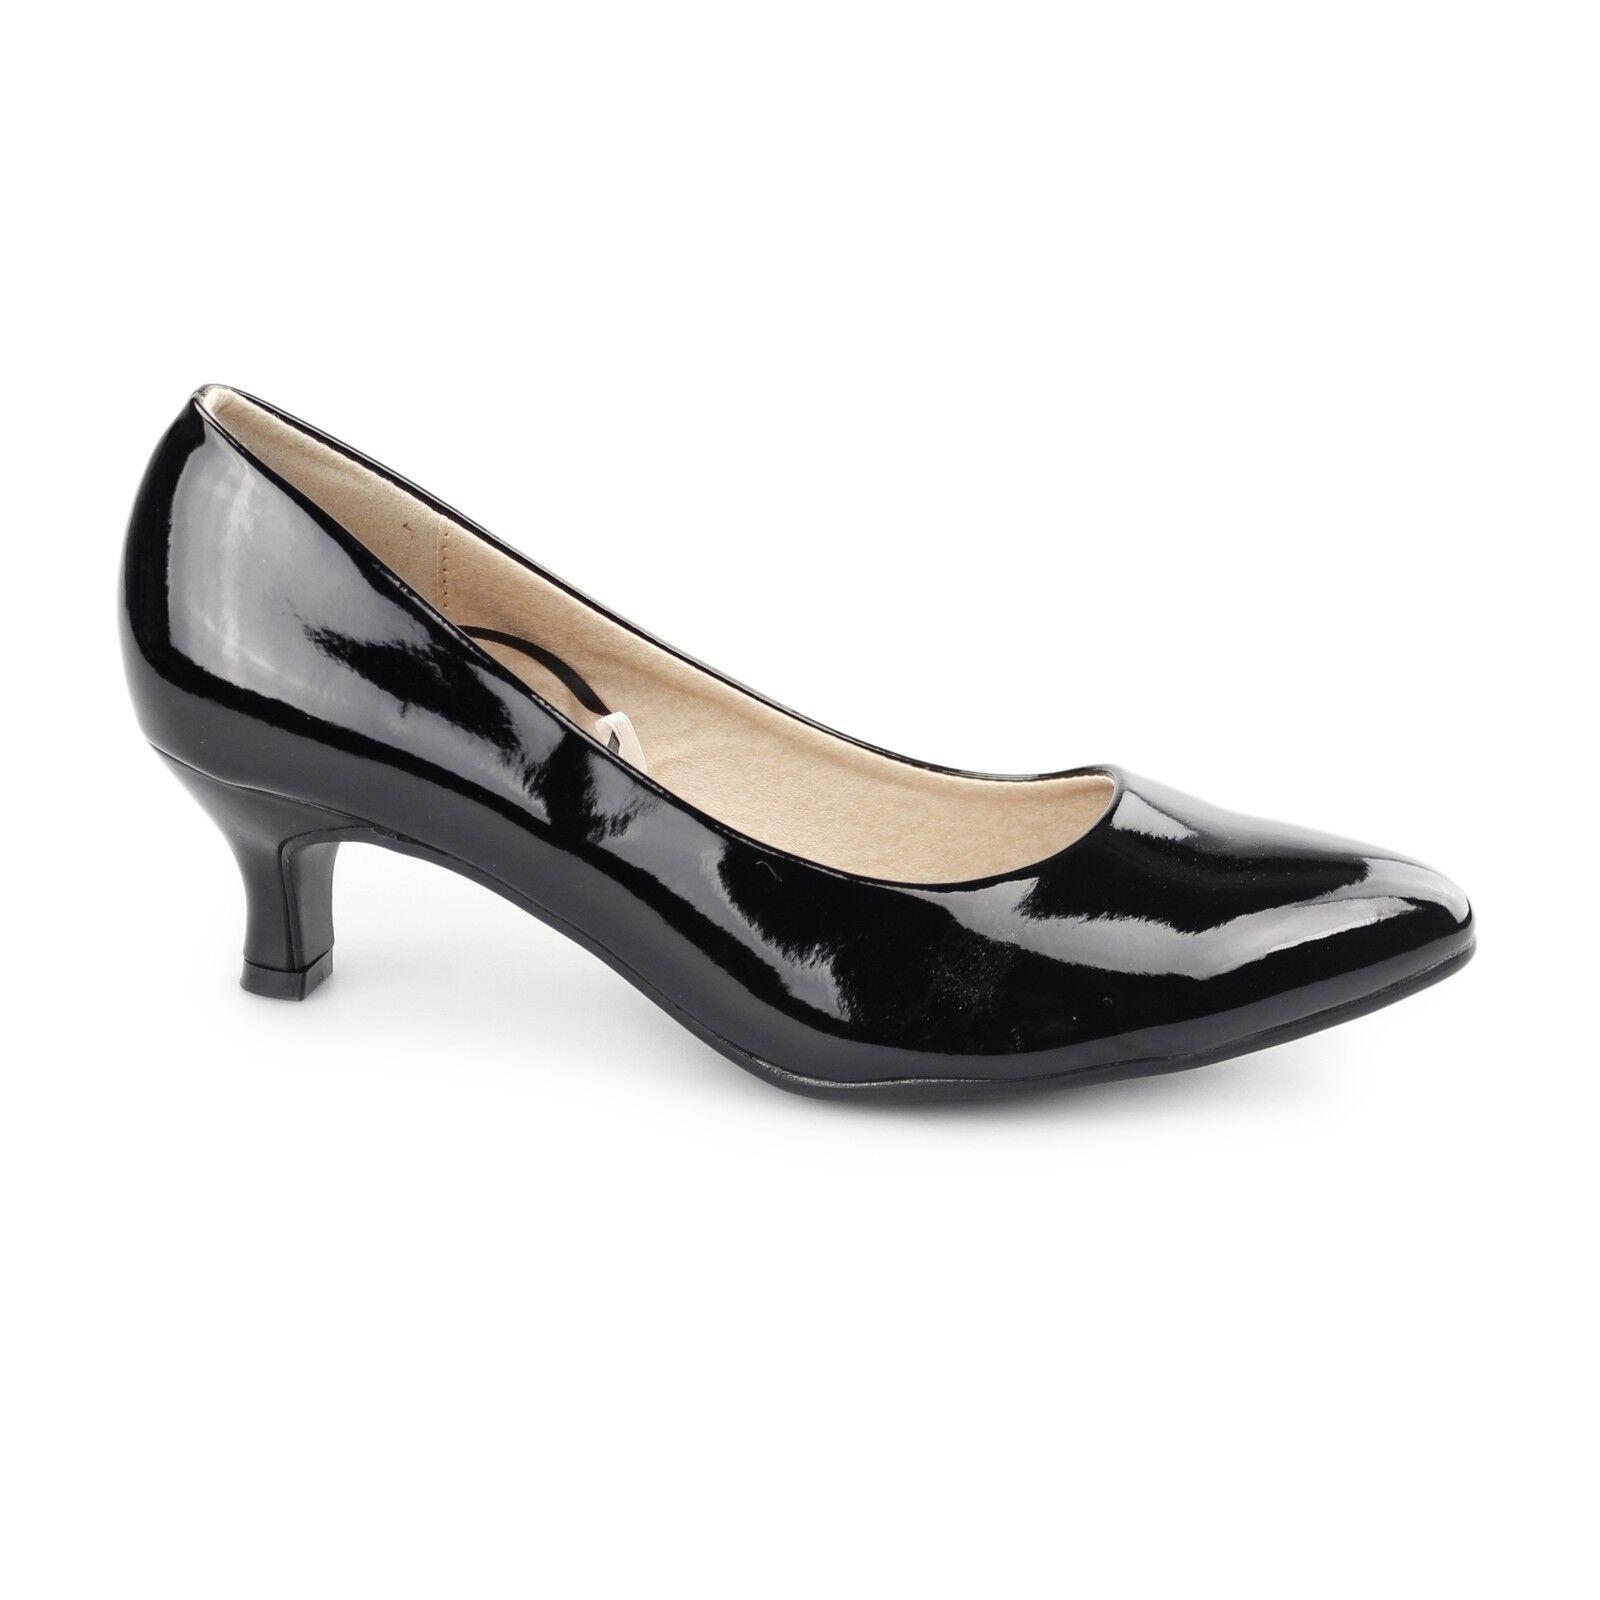 Comfort Plus TEXAS Ladies Womens Kitten Heel Wide Fit Court Shoes Patent Black